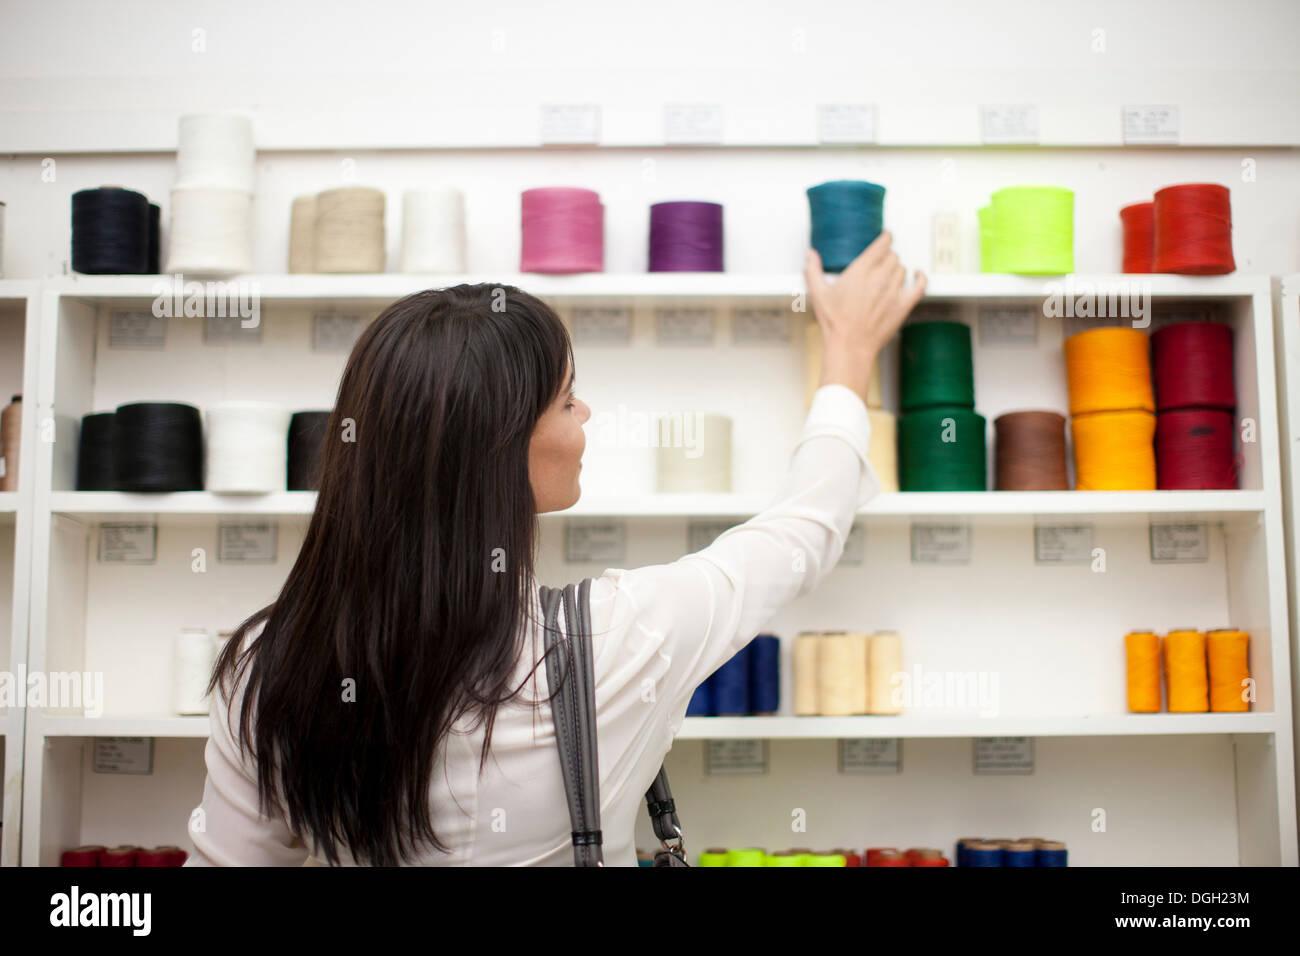 Woman choosing spool of thread in store - Stock Image